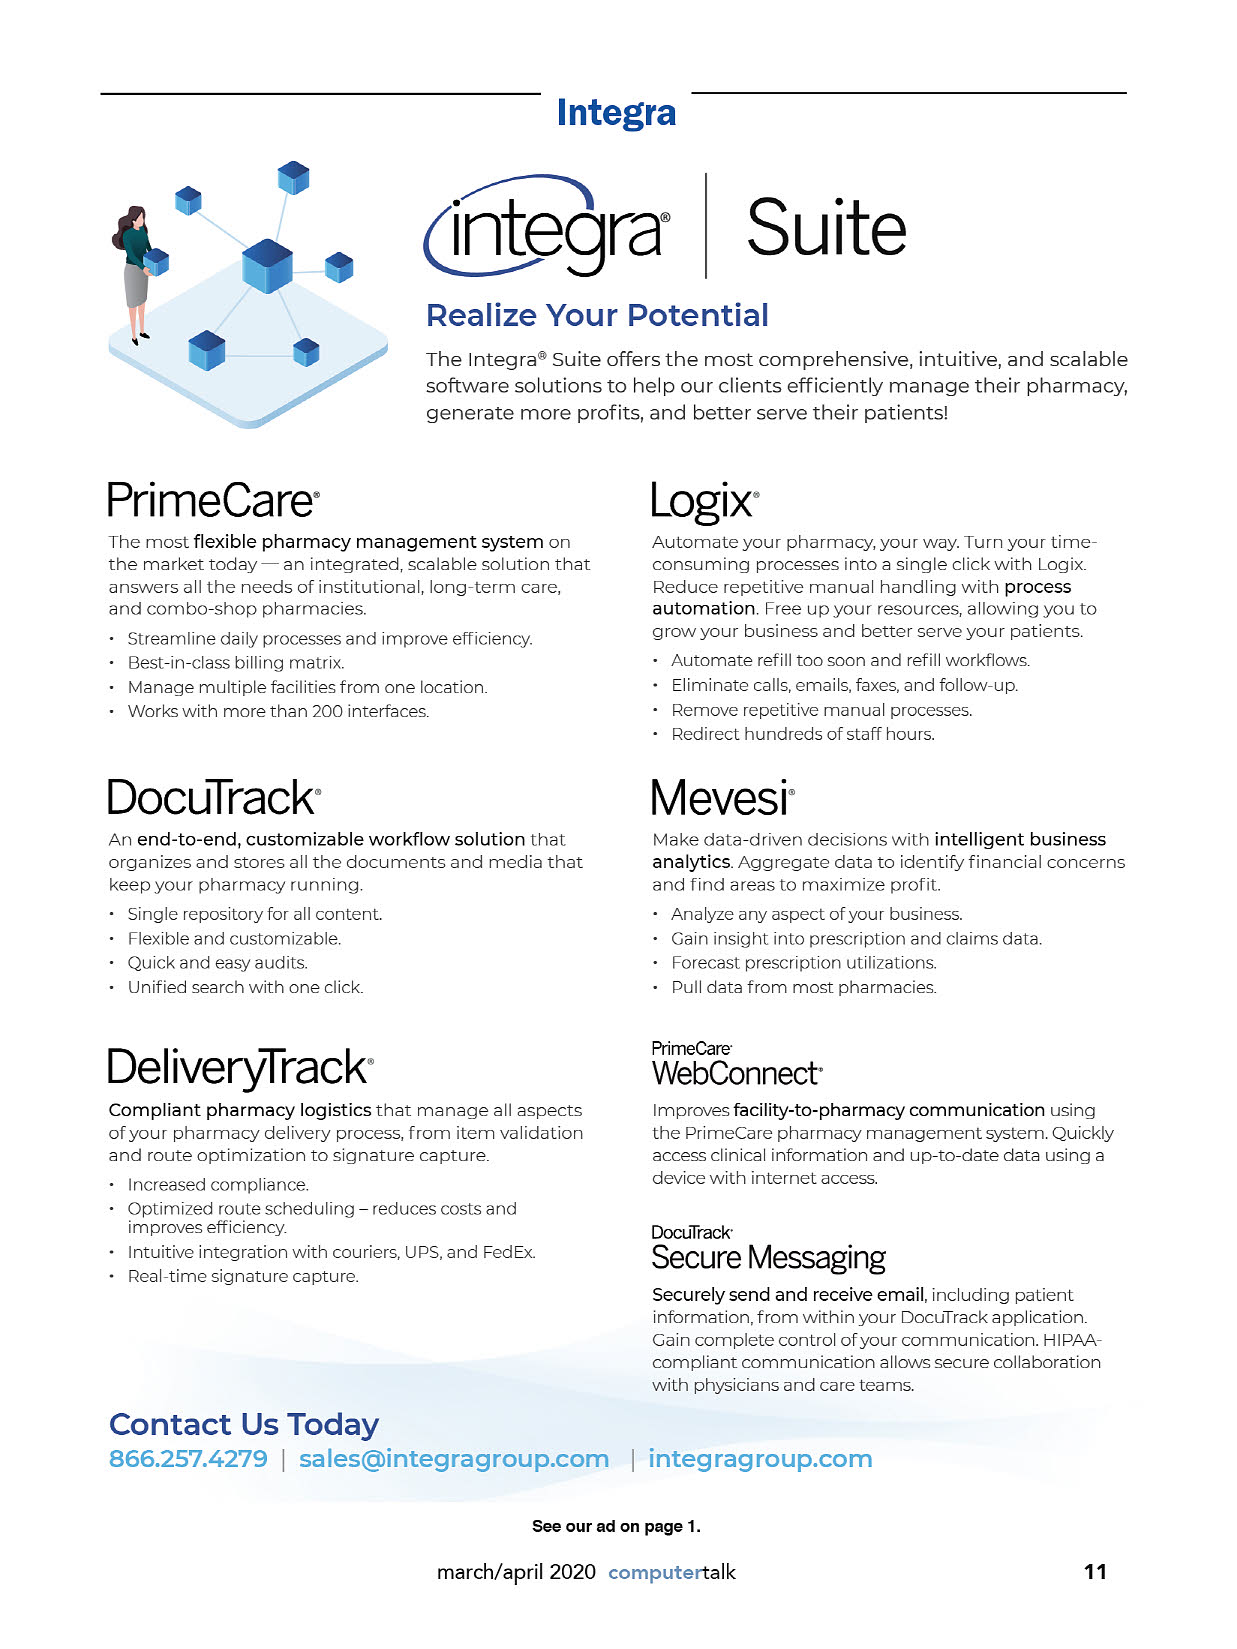 CT Buyers Guide 2020 Integra Profile